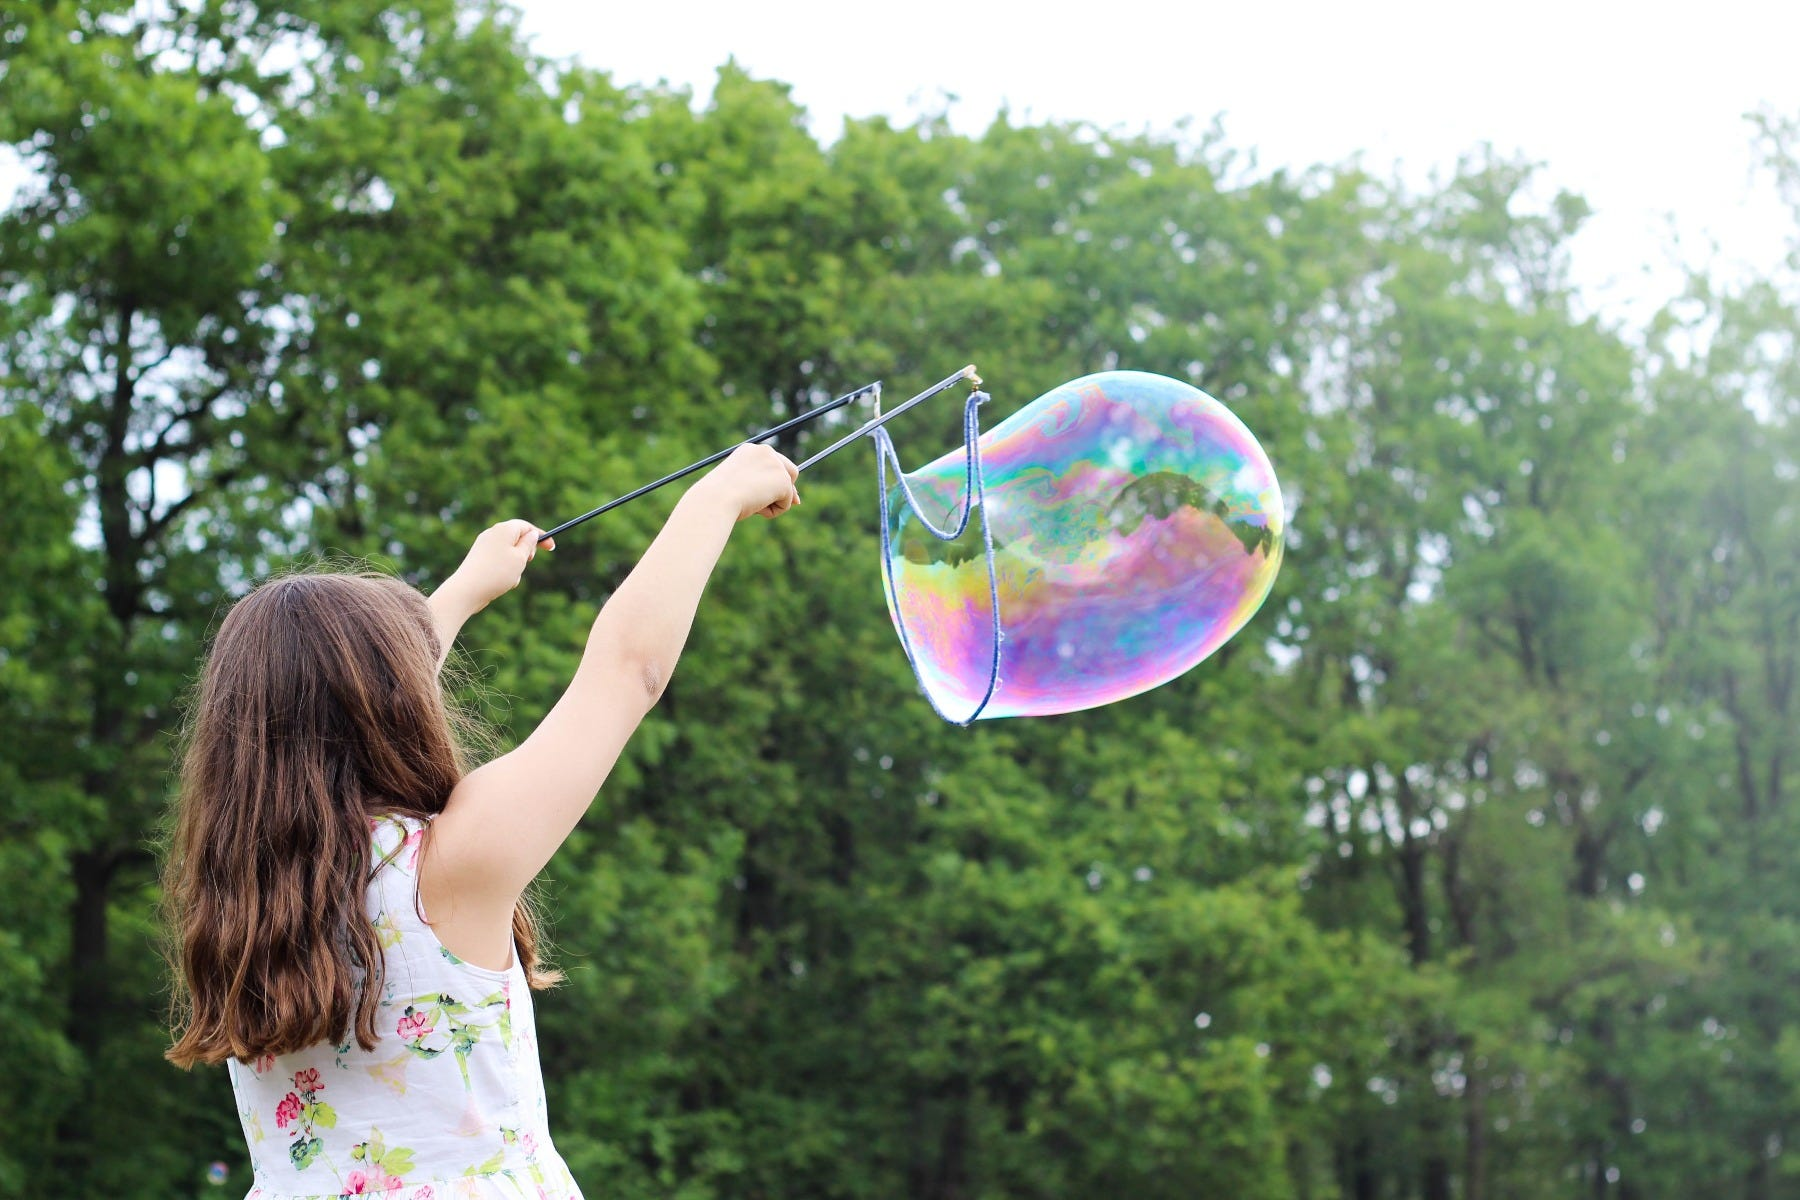 girl blowing bubbles outside